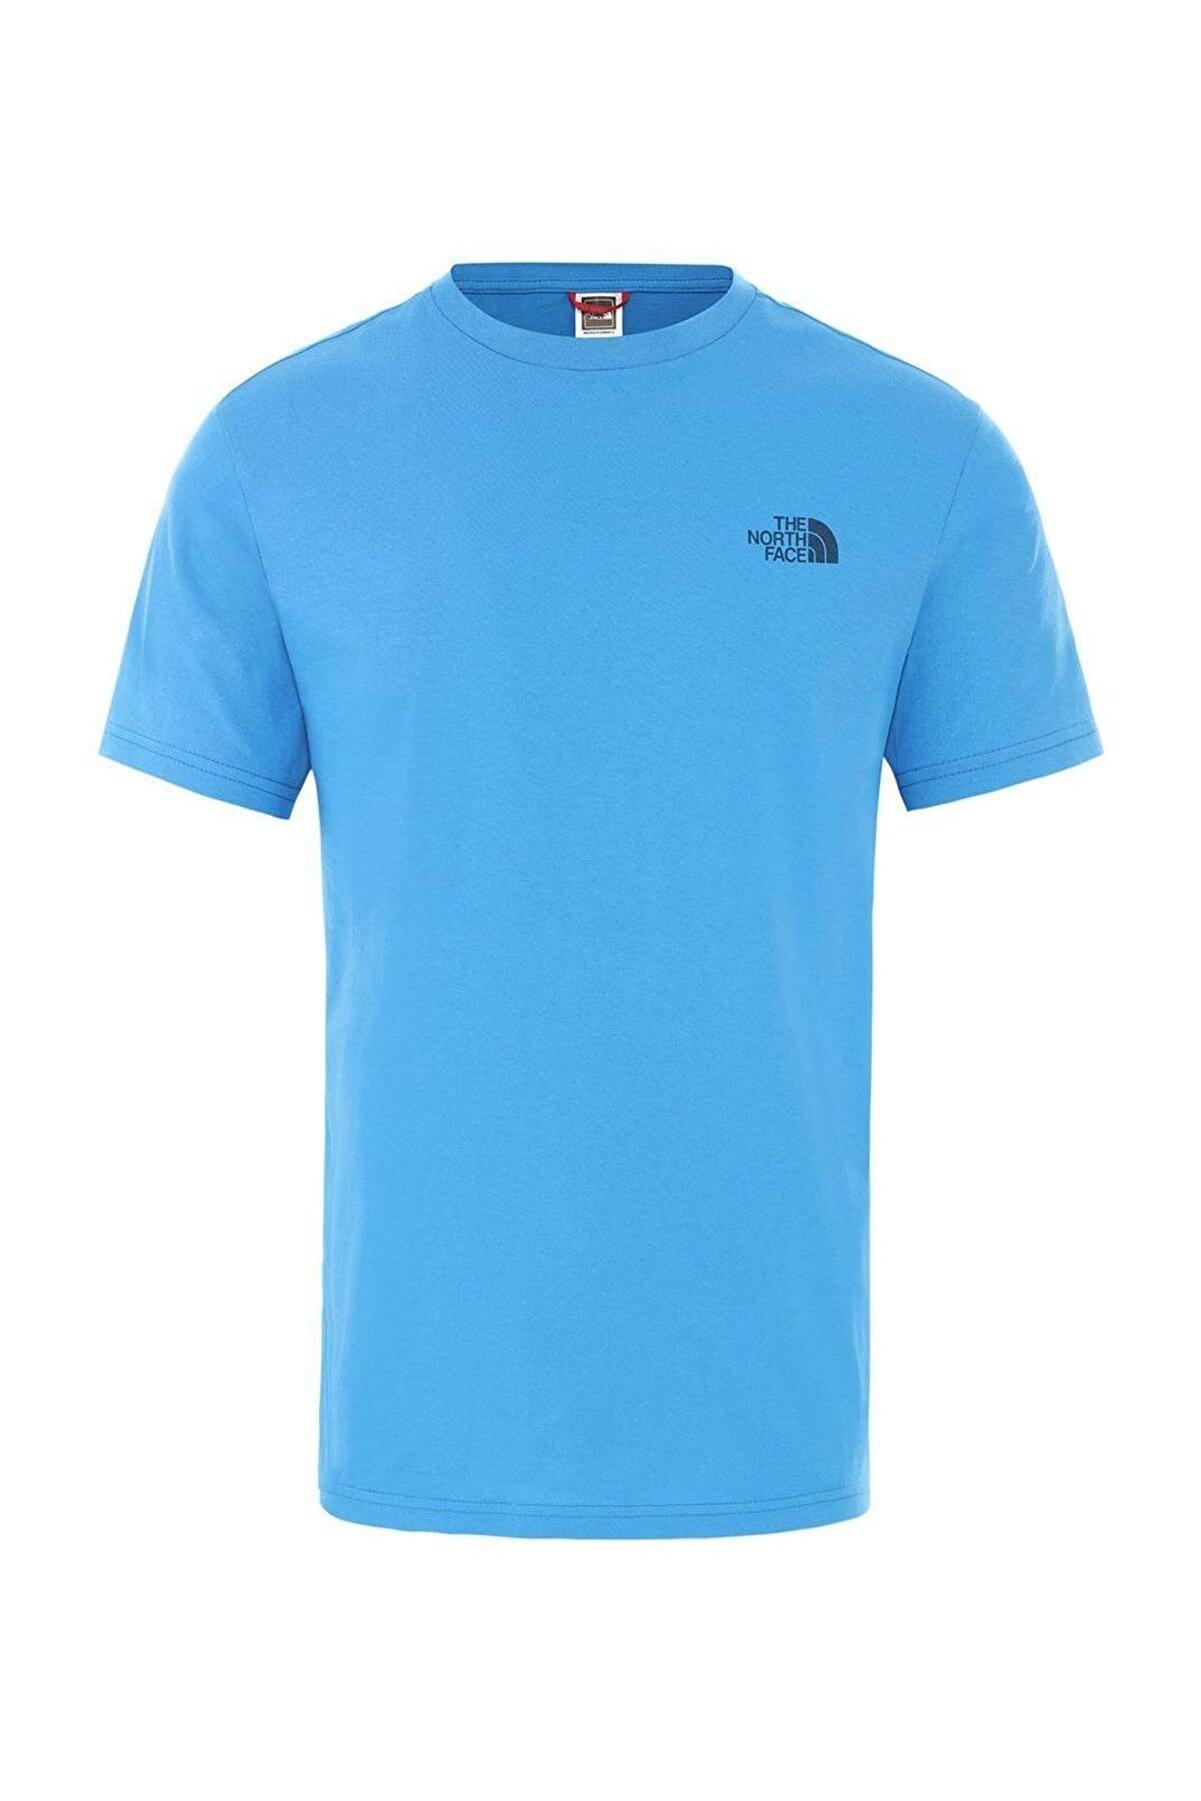 The North Face M S/S SIMPLE DOME  EU Açık Mavi Erkek T-Shirt 100576725